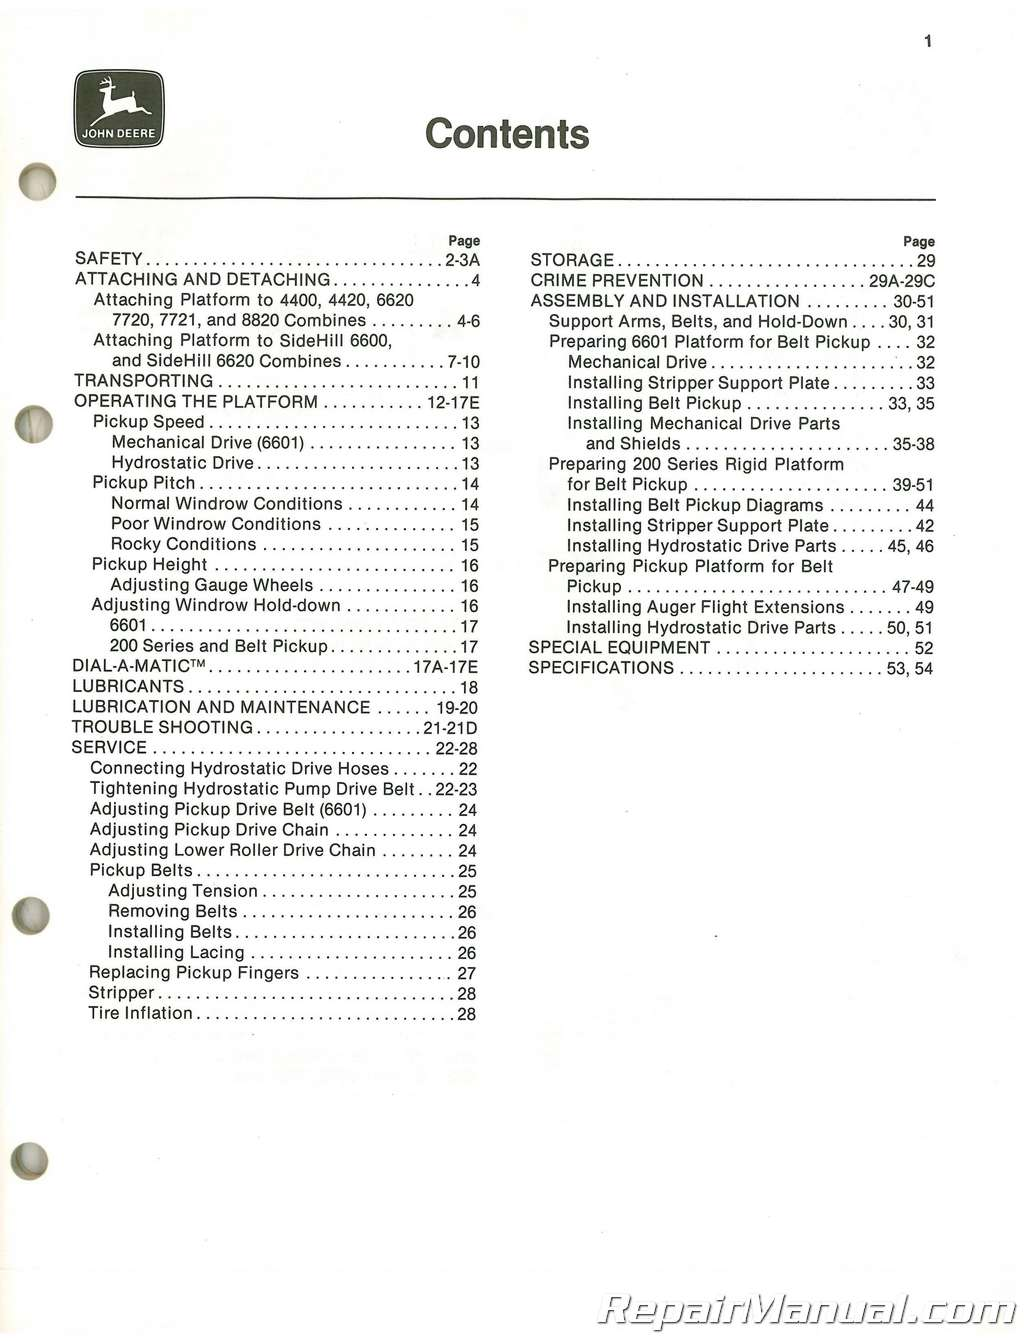 Used John Deere 110 132 And 154 In Three Roller Belt